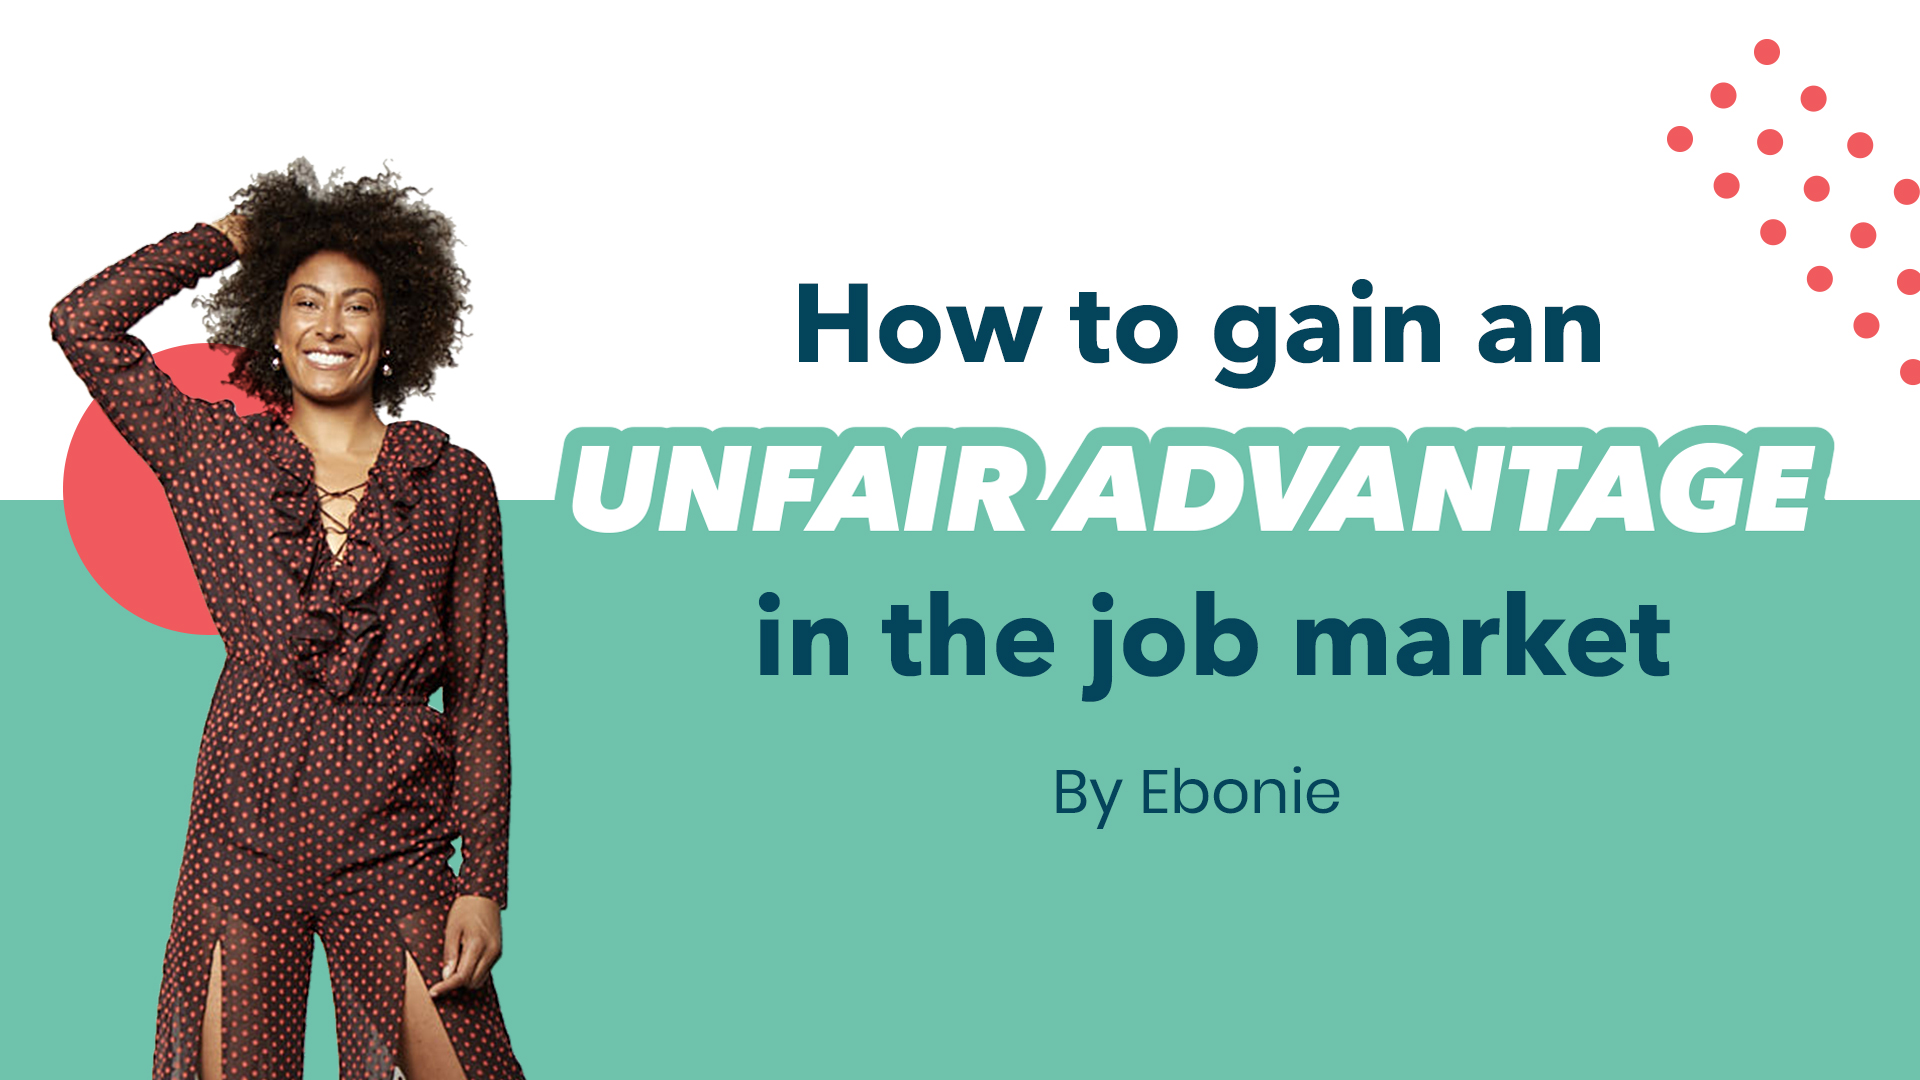 How to gain an unfair advantage in the job market